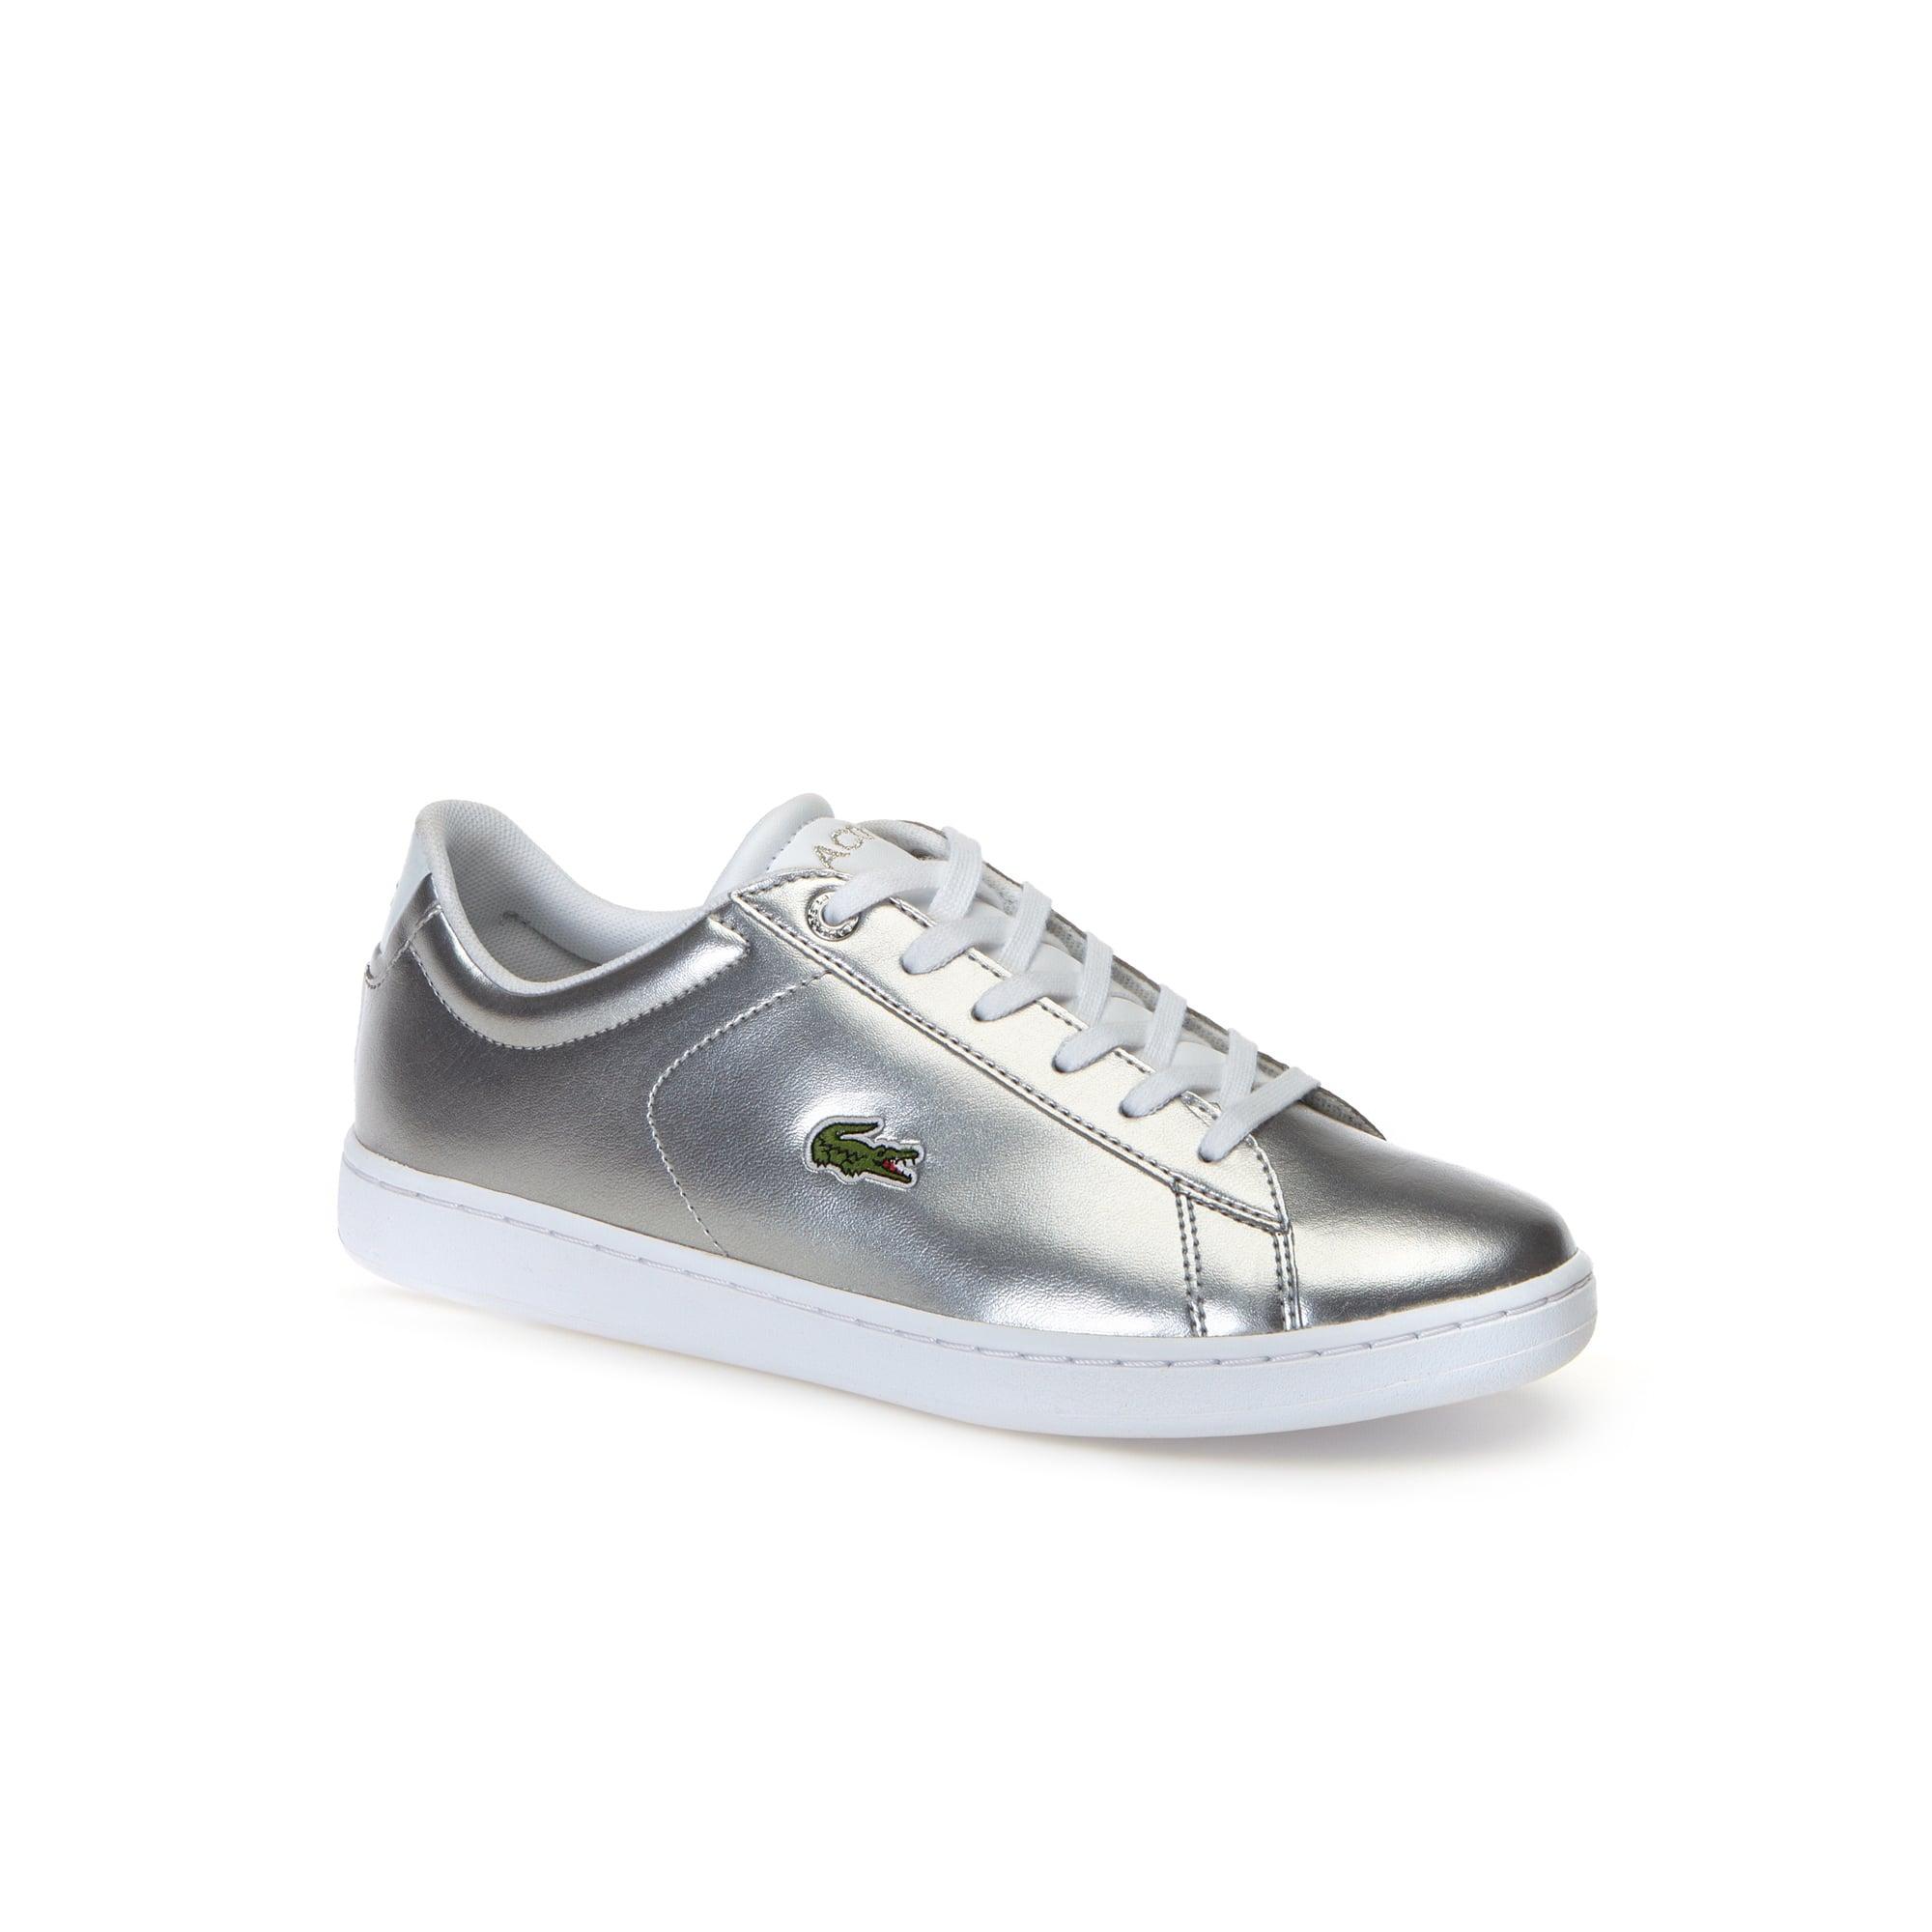 Sneakers Carnaby Evo enfant couleur argent en synthétique